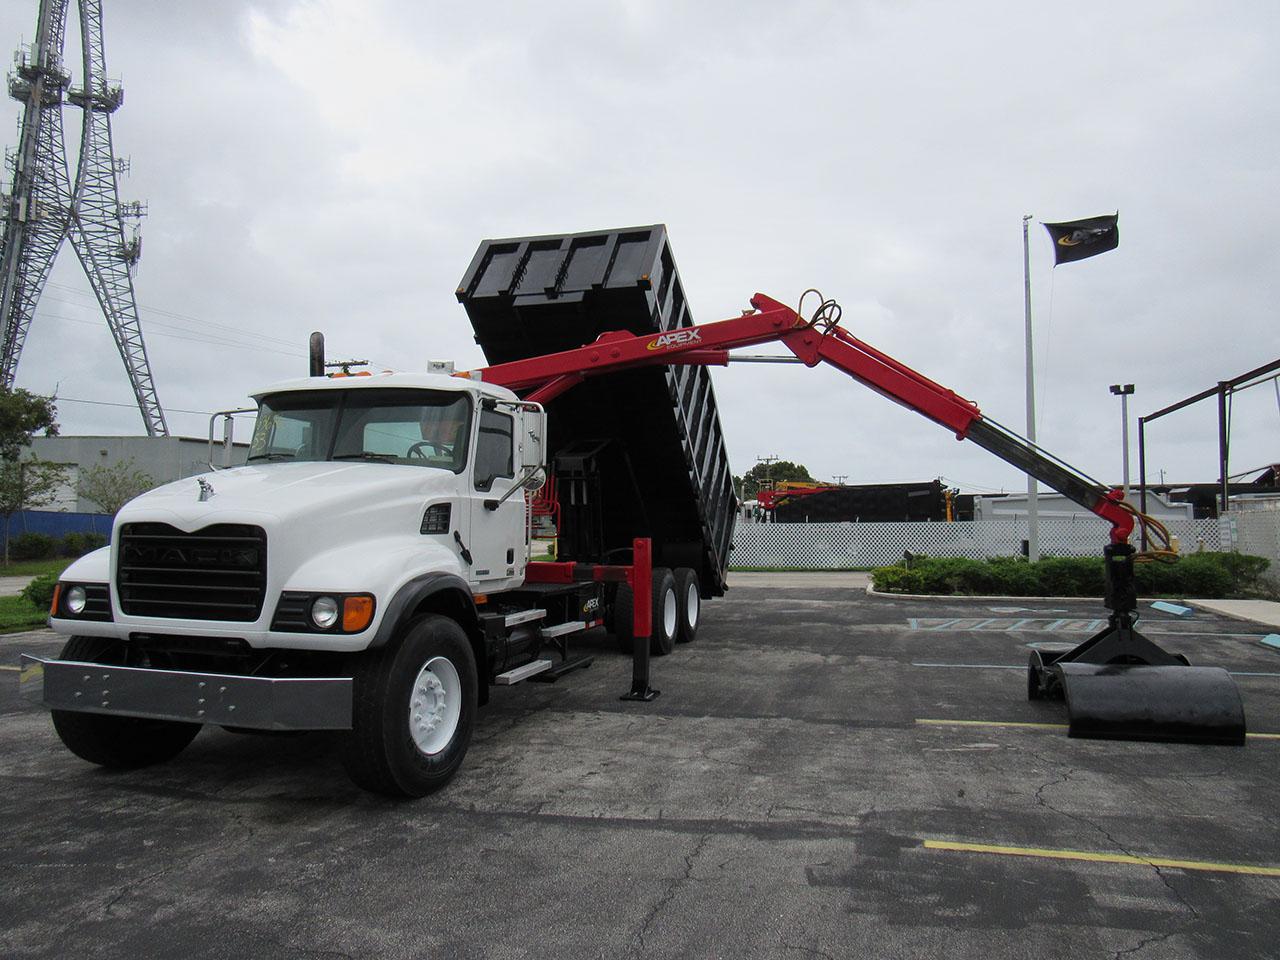 used 2007 Mack CV713 in West Palm Beach, FL